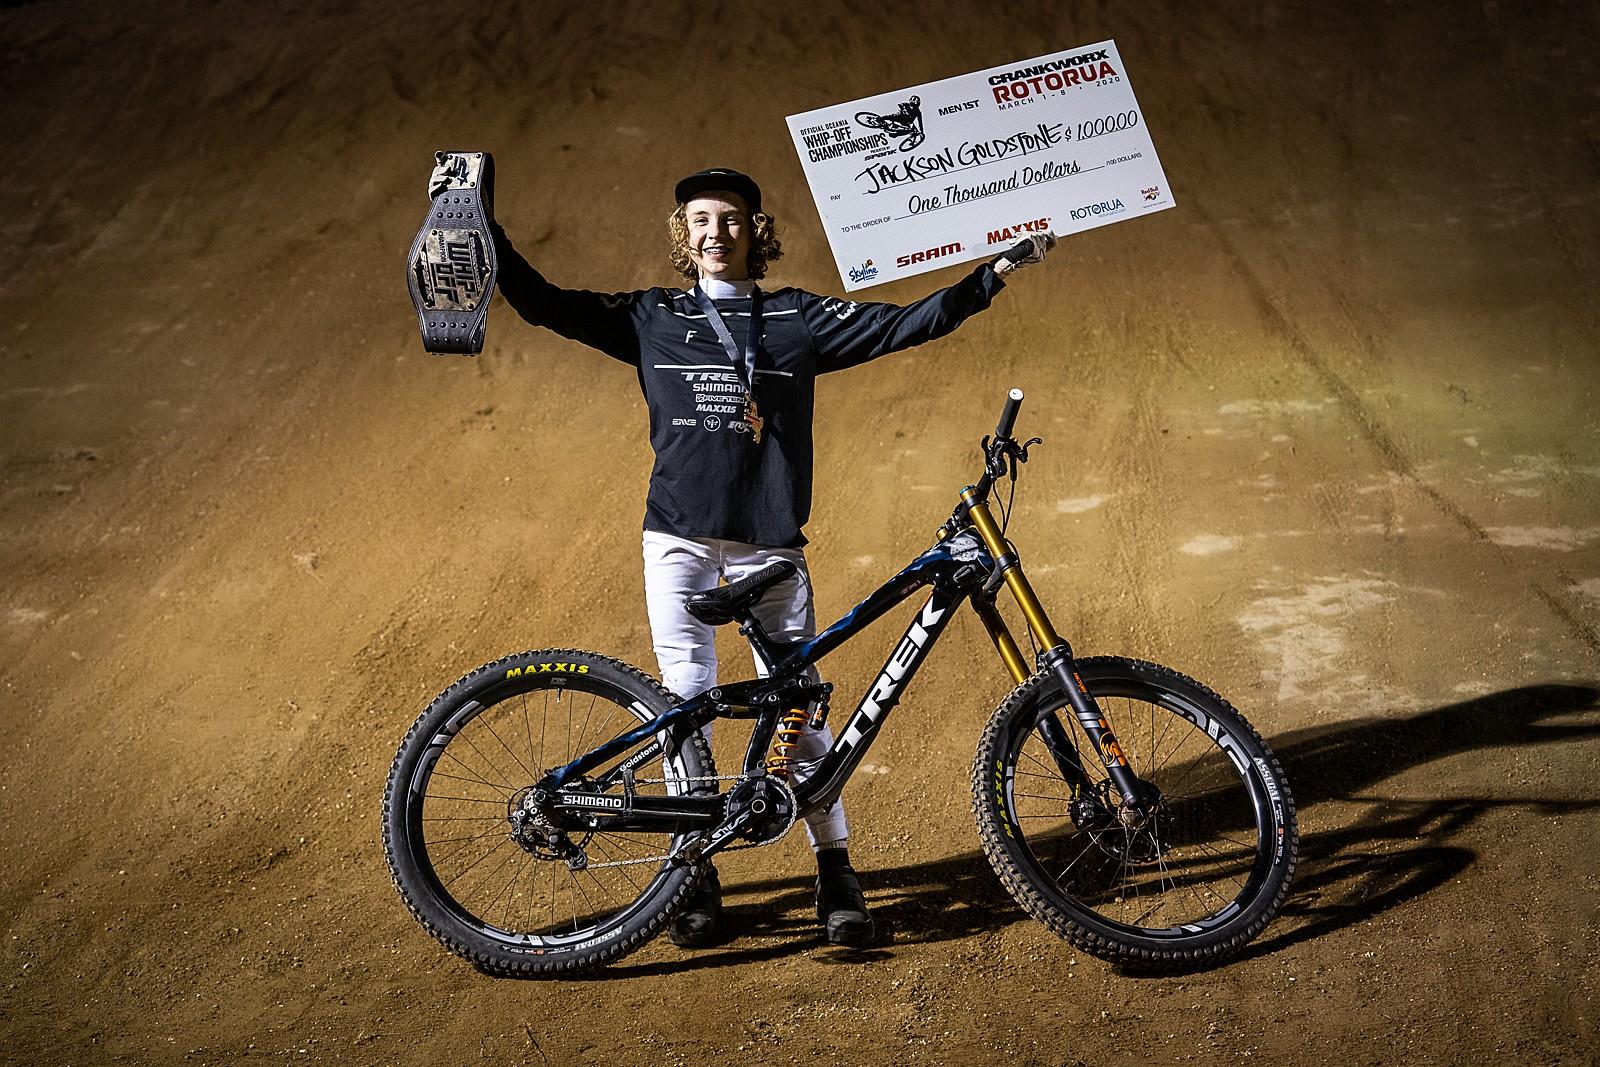 Jackson Goldstone Wins - Crankworx New Zealand Whip-Off Photo Gallery - Mountain Biking Pictures - Vital MTB